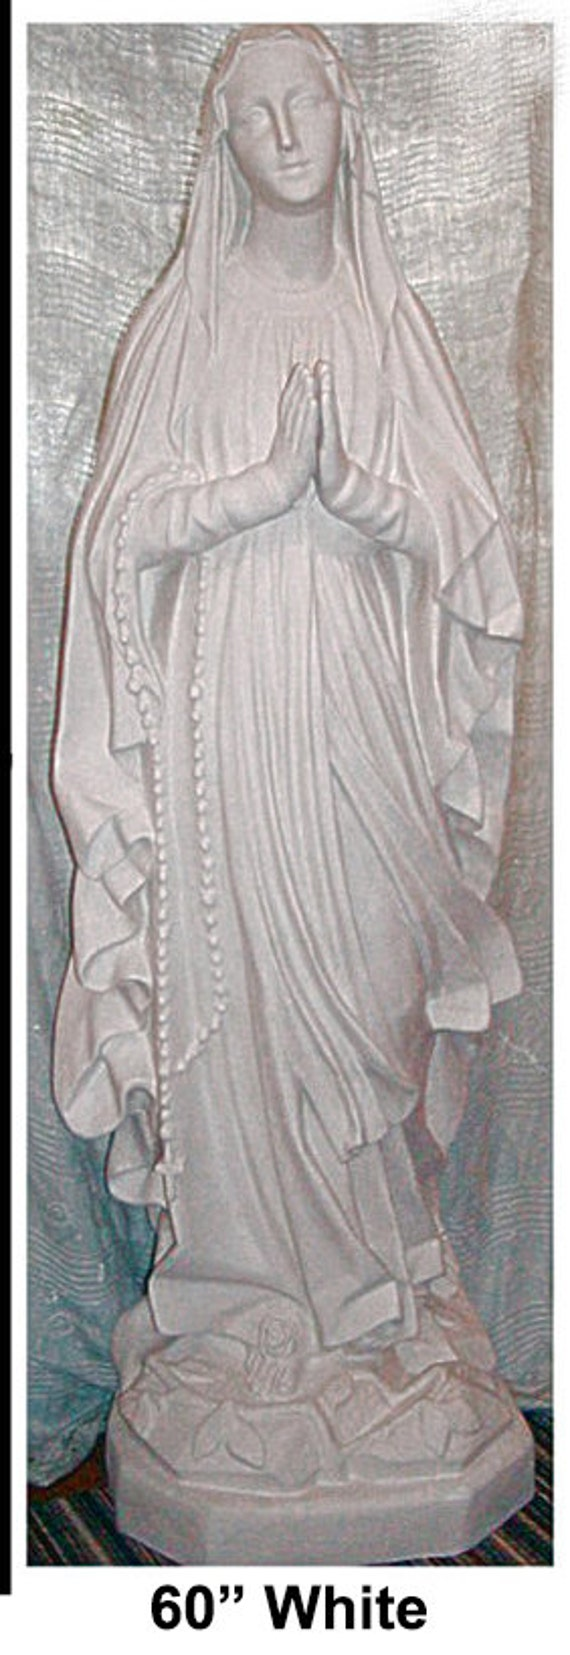 "Our Lady of Lourdes 60"" Fiberglass Catholic Christian Religious Mary Statue"